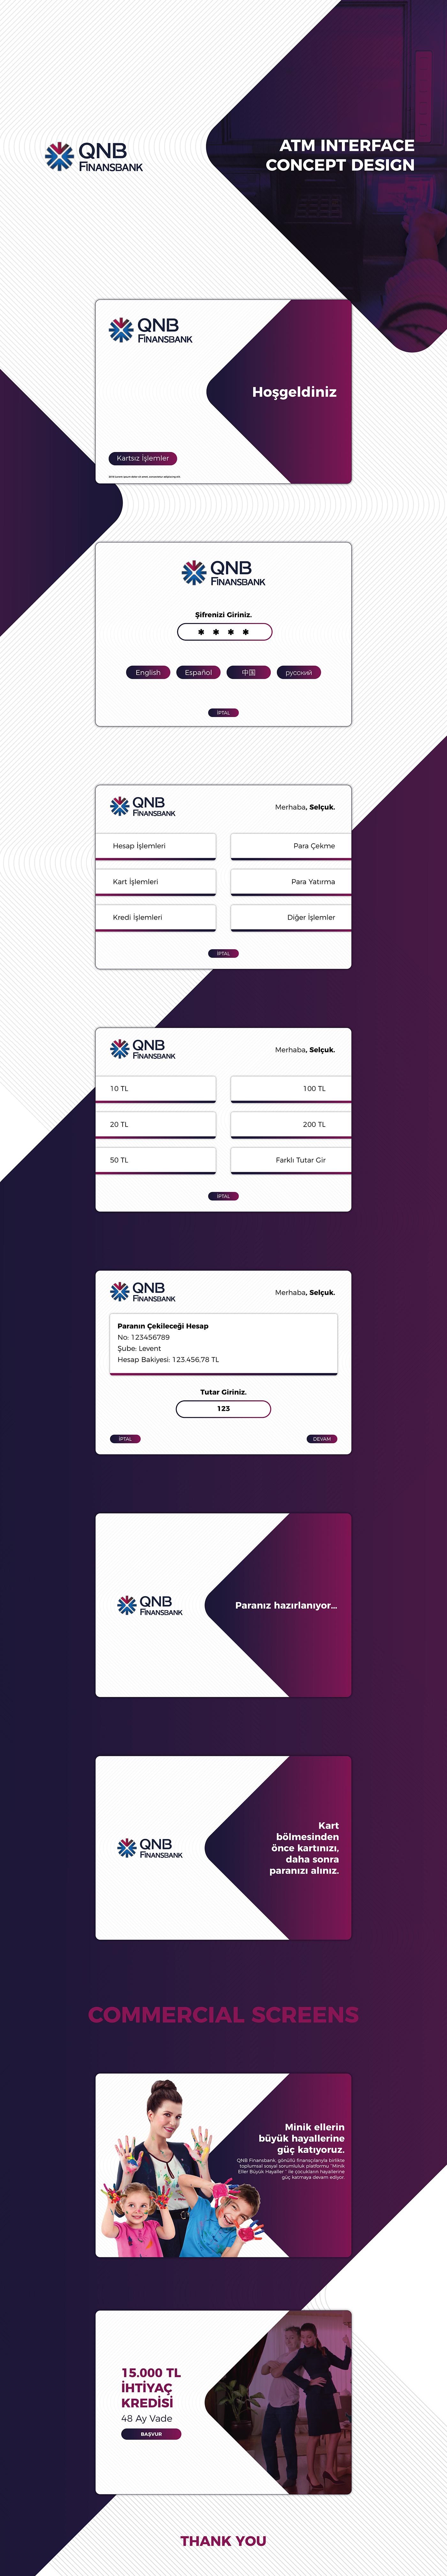 UI ux ui design UX design Interface Web interaction interface design